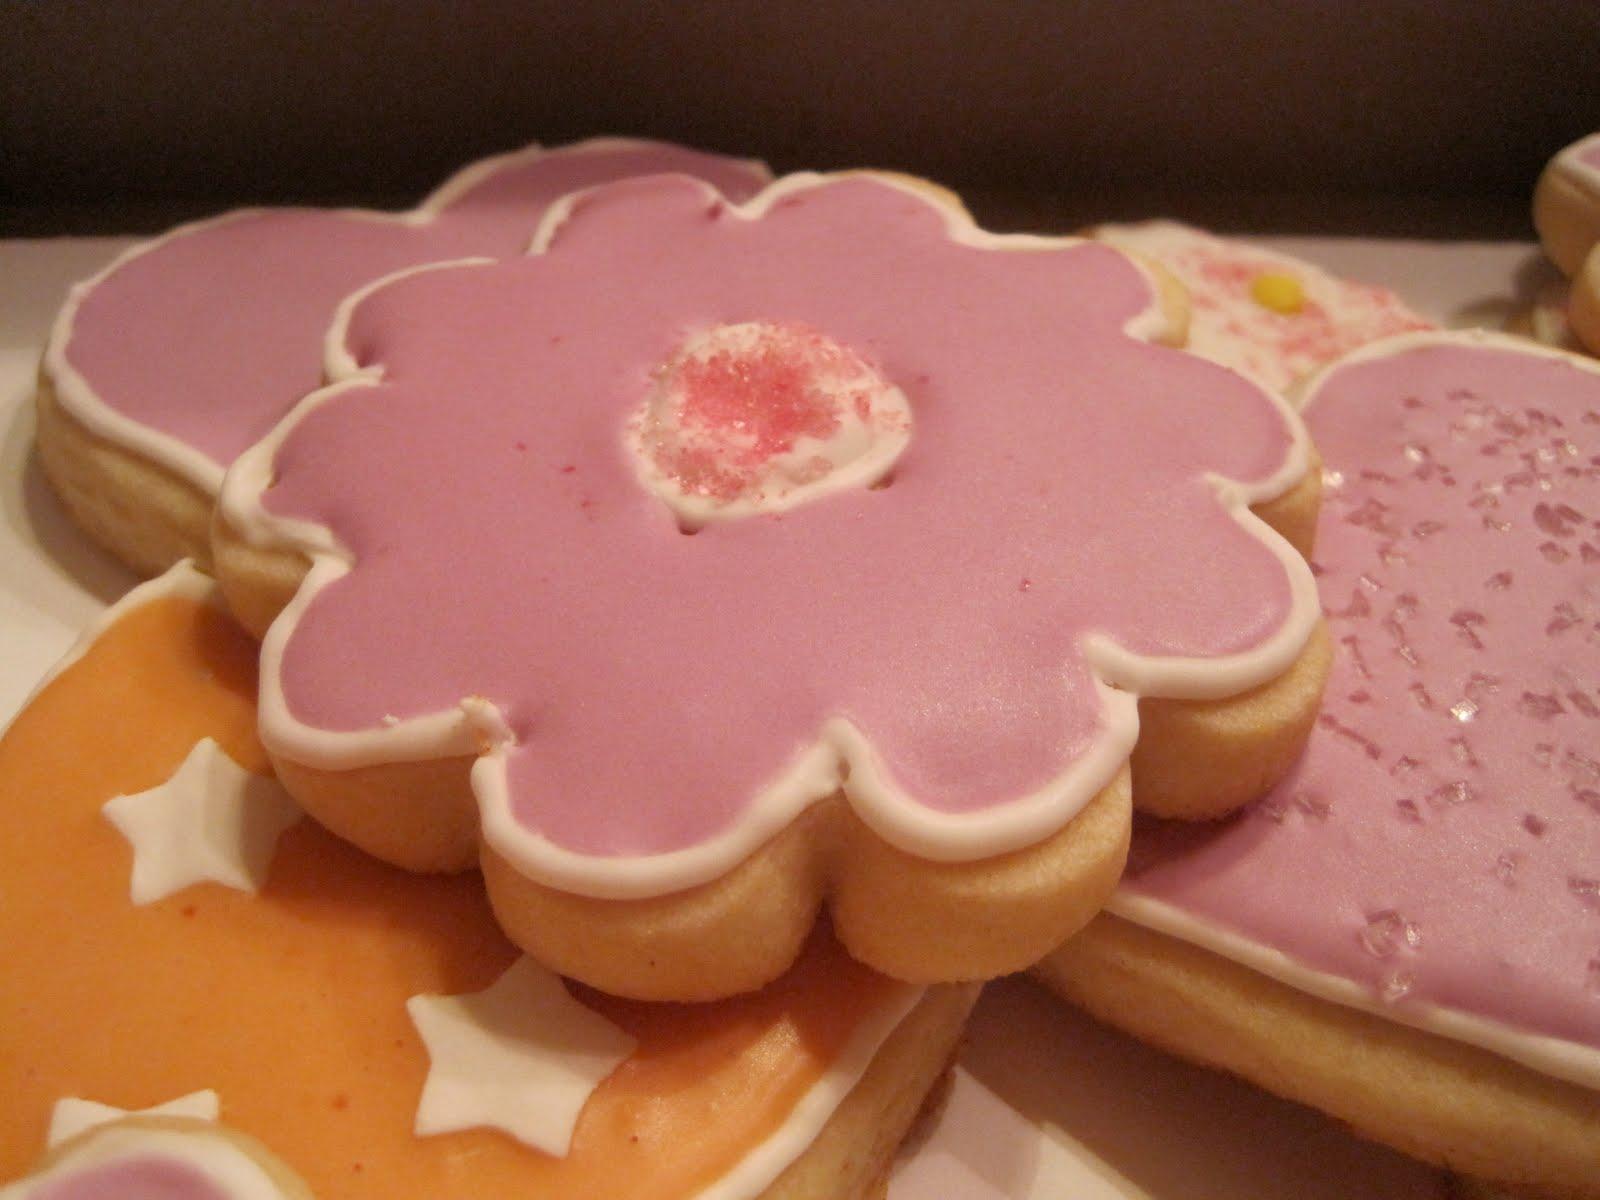 Naturally Colored Sugar Cookies | Sarah Kate\'s Bakery